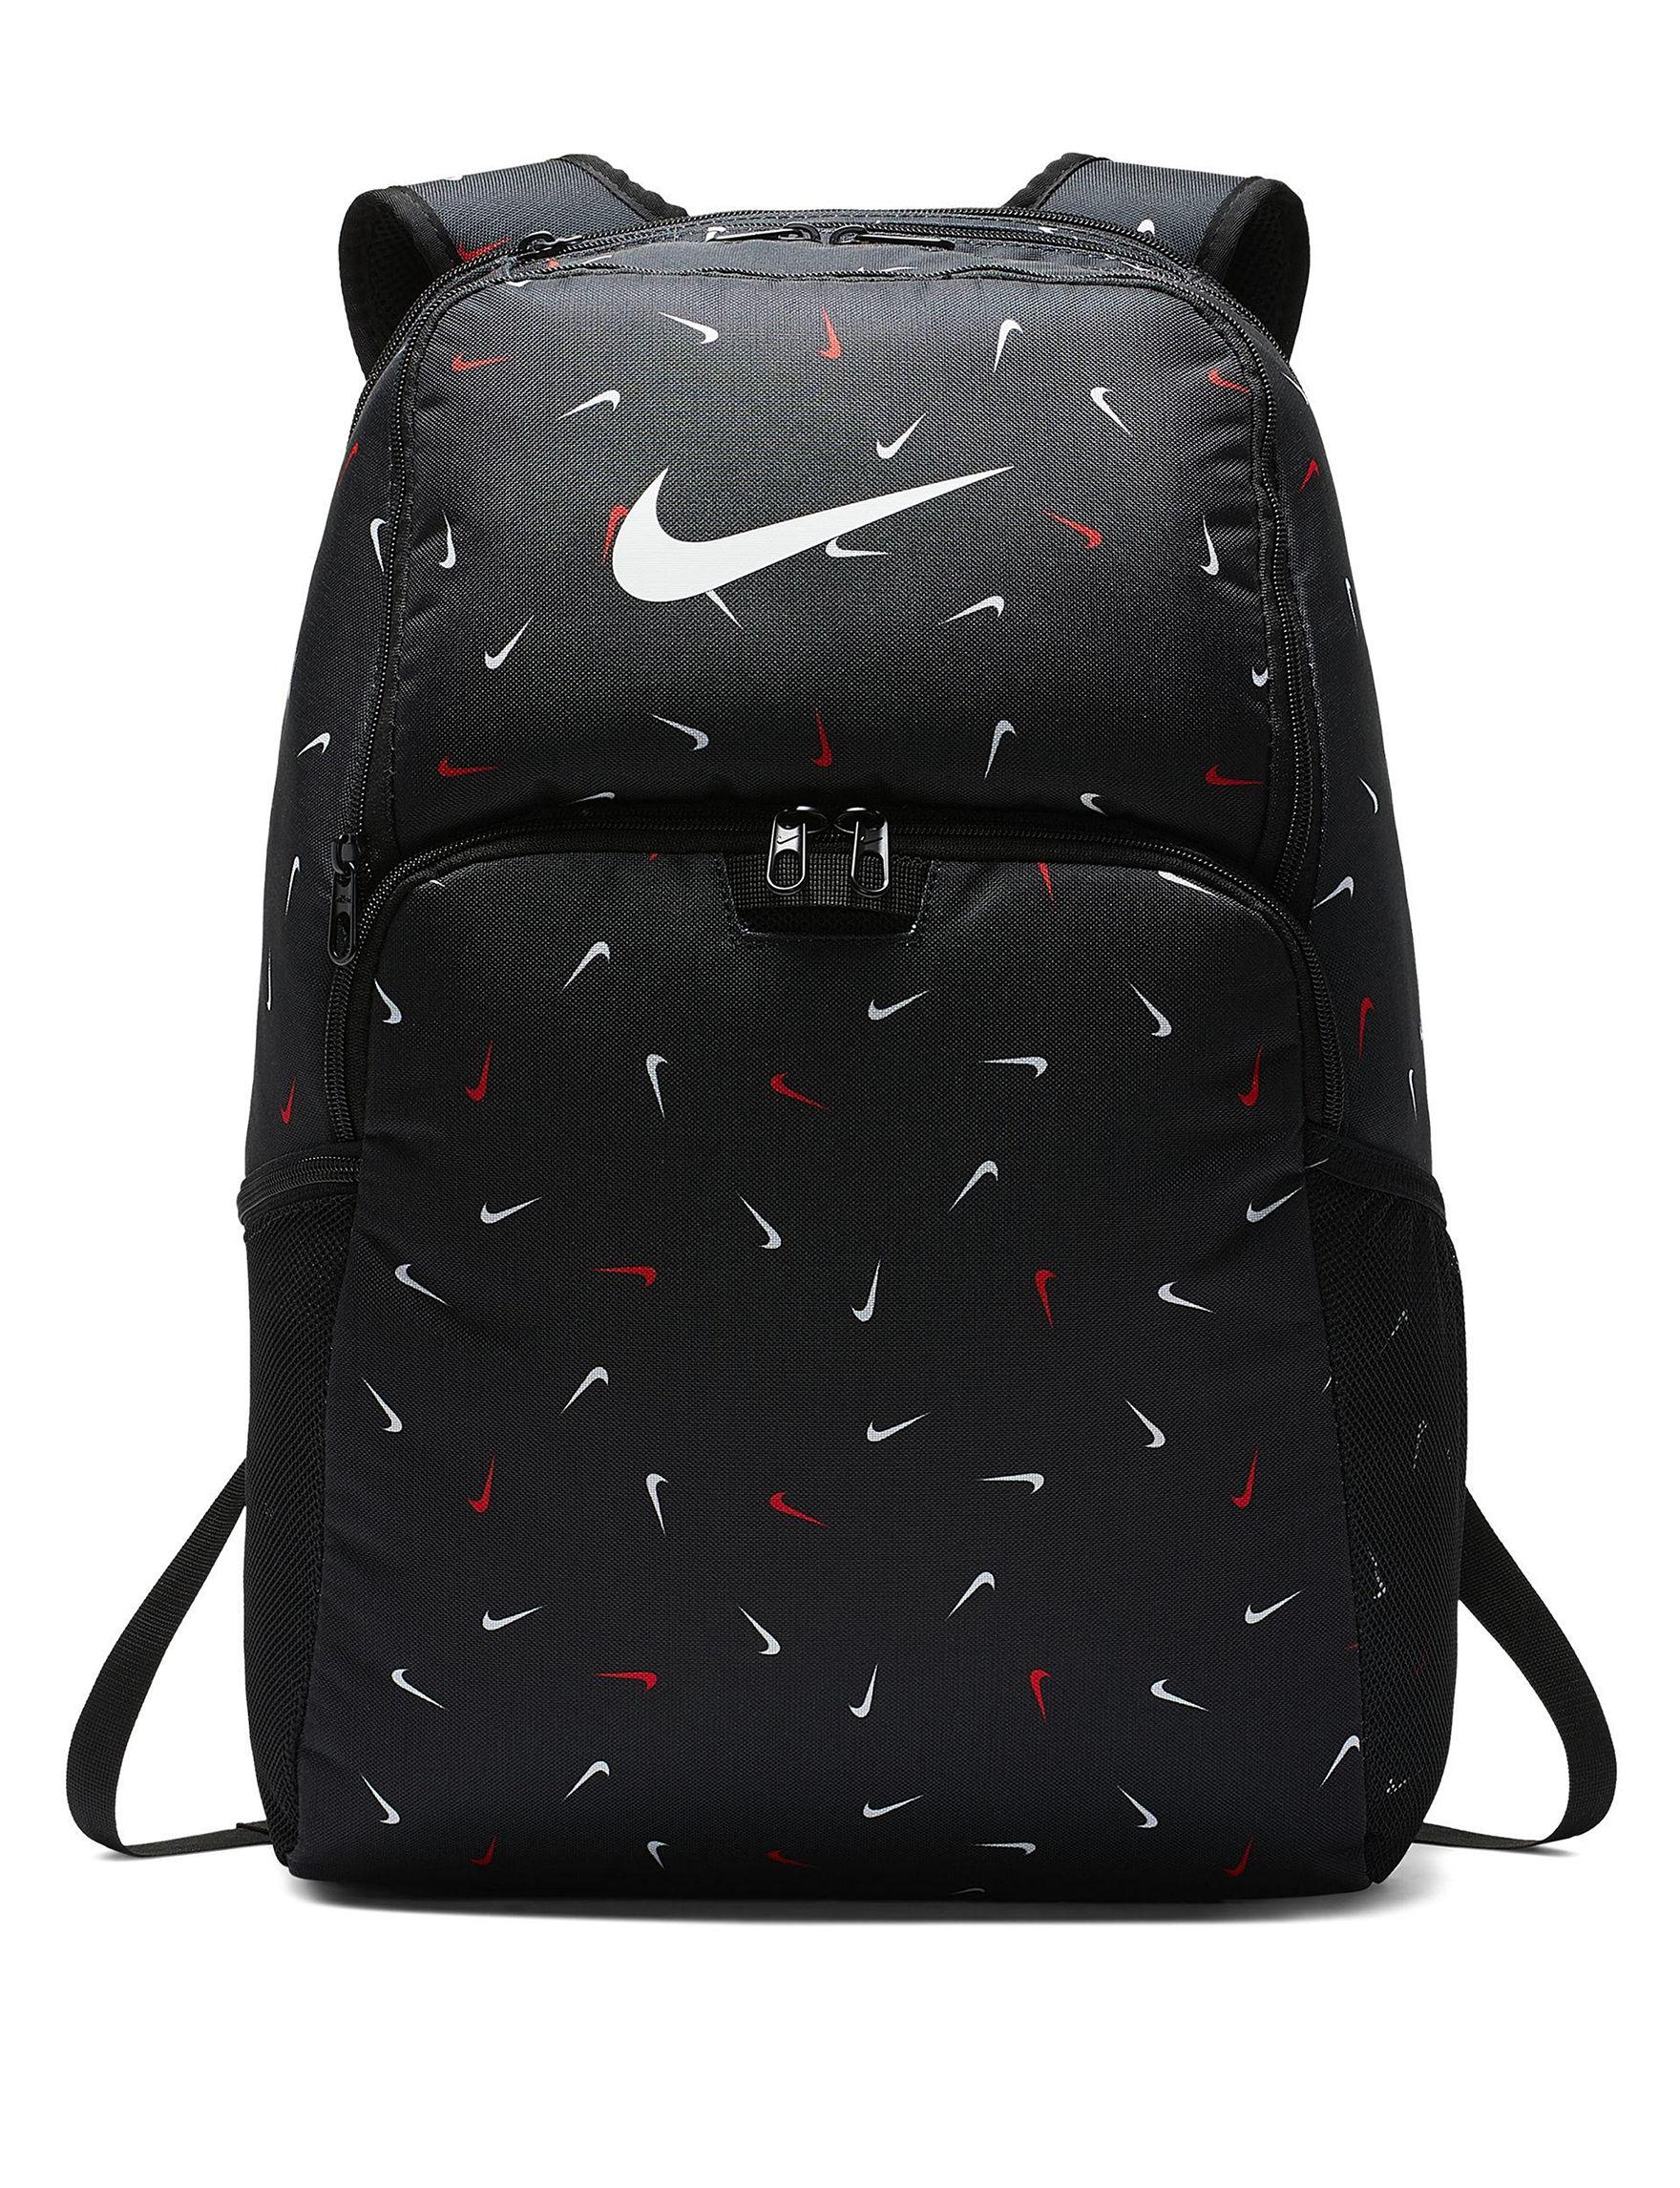 Nike Grey / Multi Tees & Tanks Bookbags & Backpacks